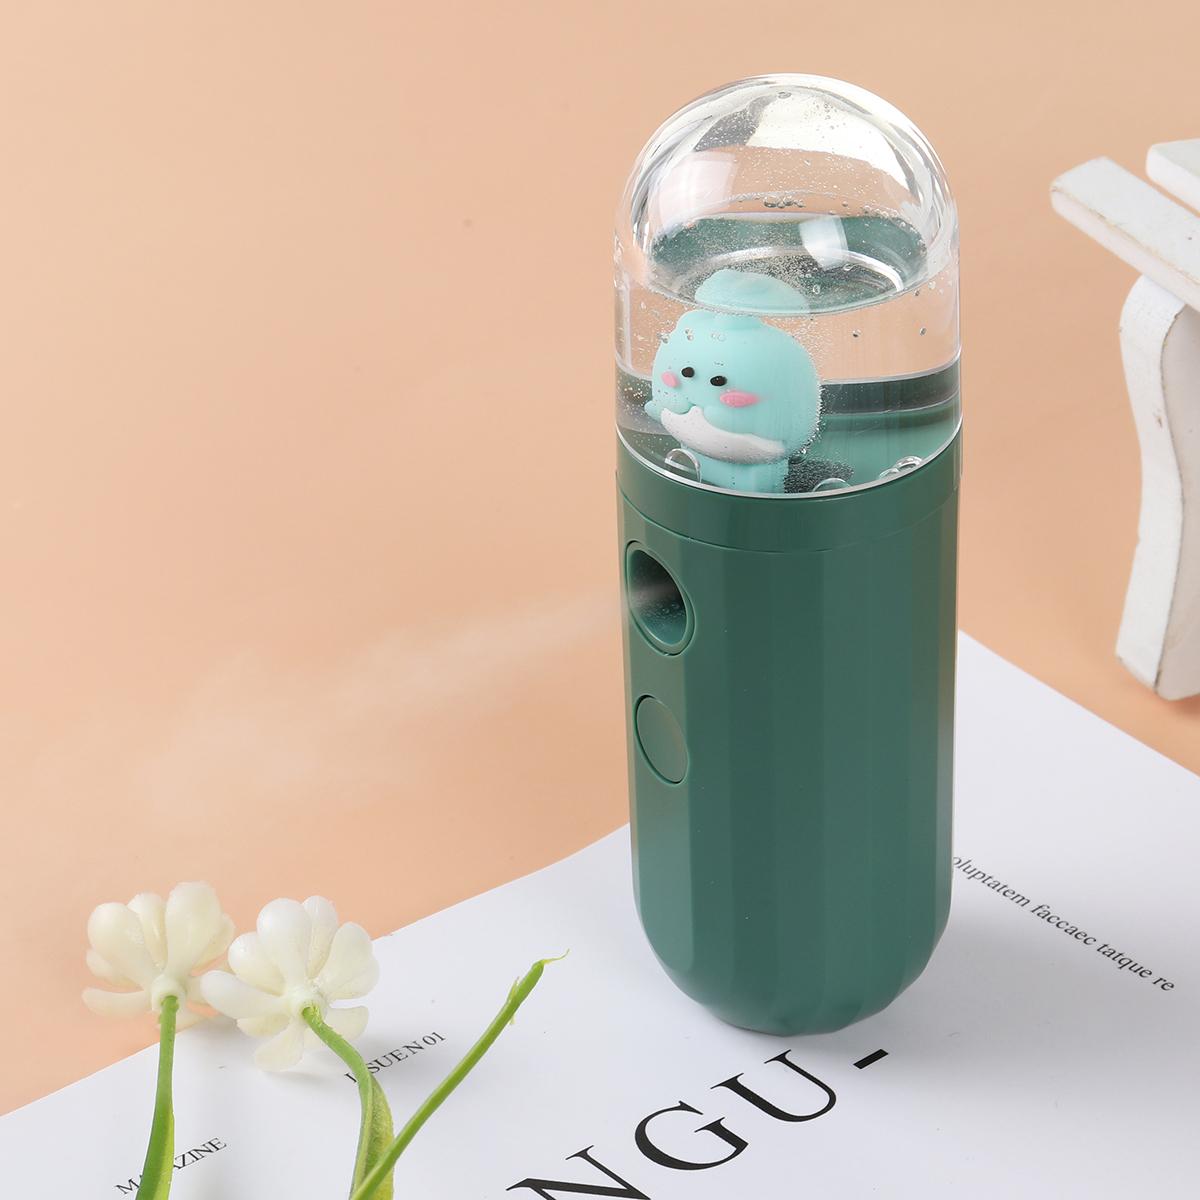 5V Portable Mini humidifier Nanometer Fine Fog USB Charging 250mAh Battery Life Low Noise for Home Car Office